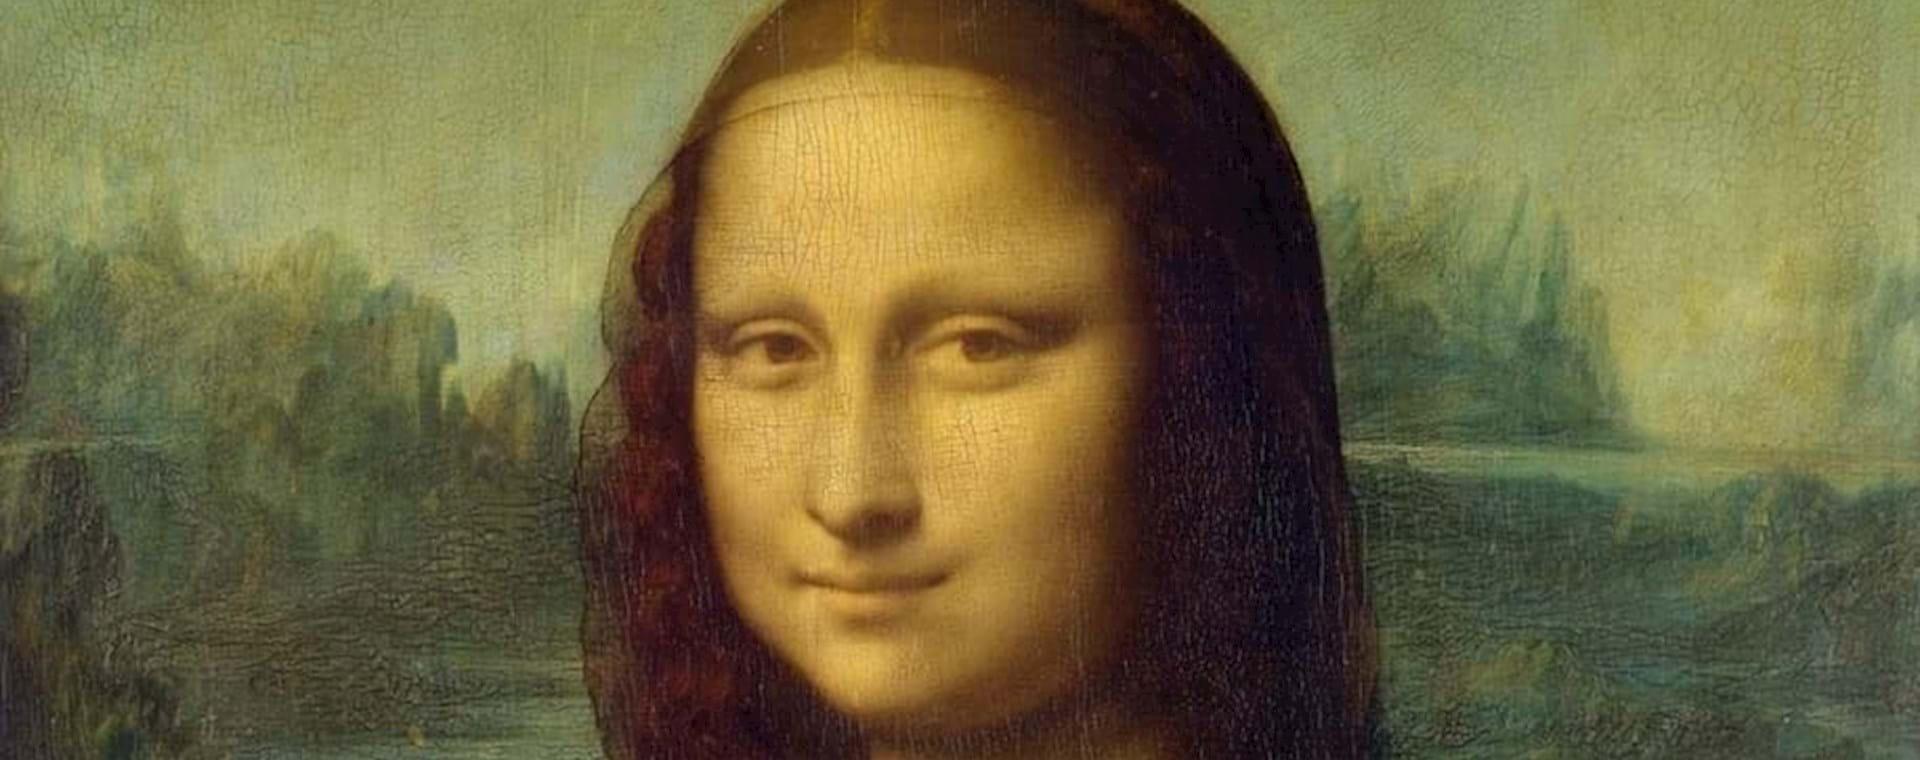 Mona Lisa Portrait Closeup